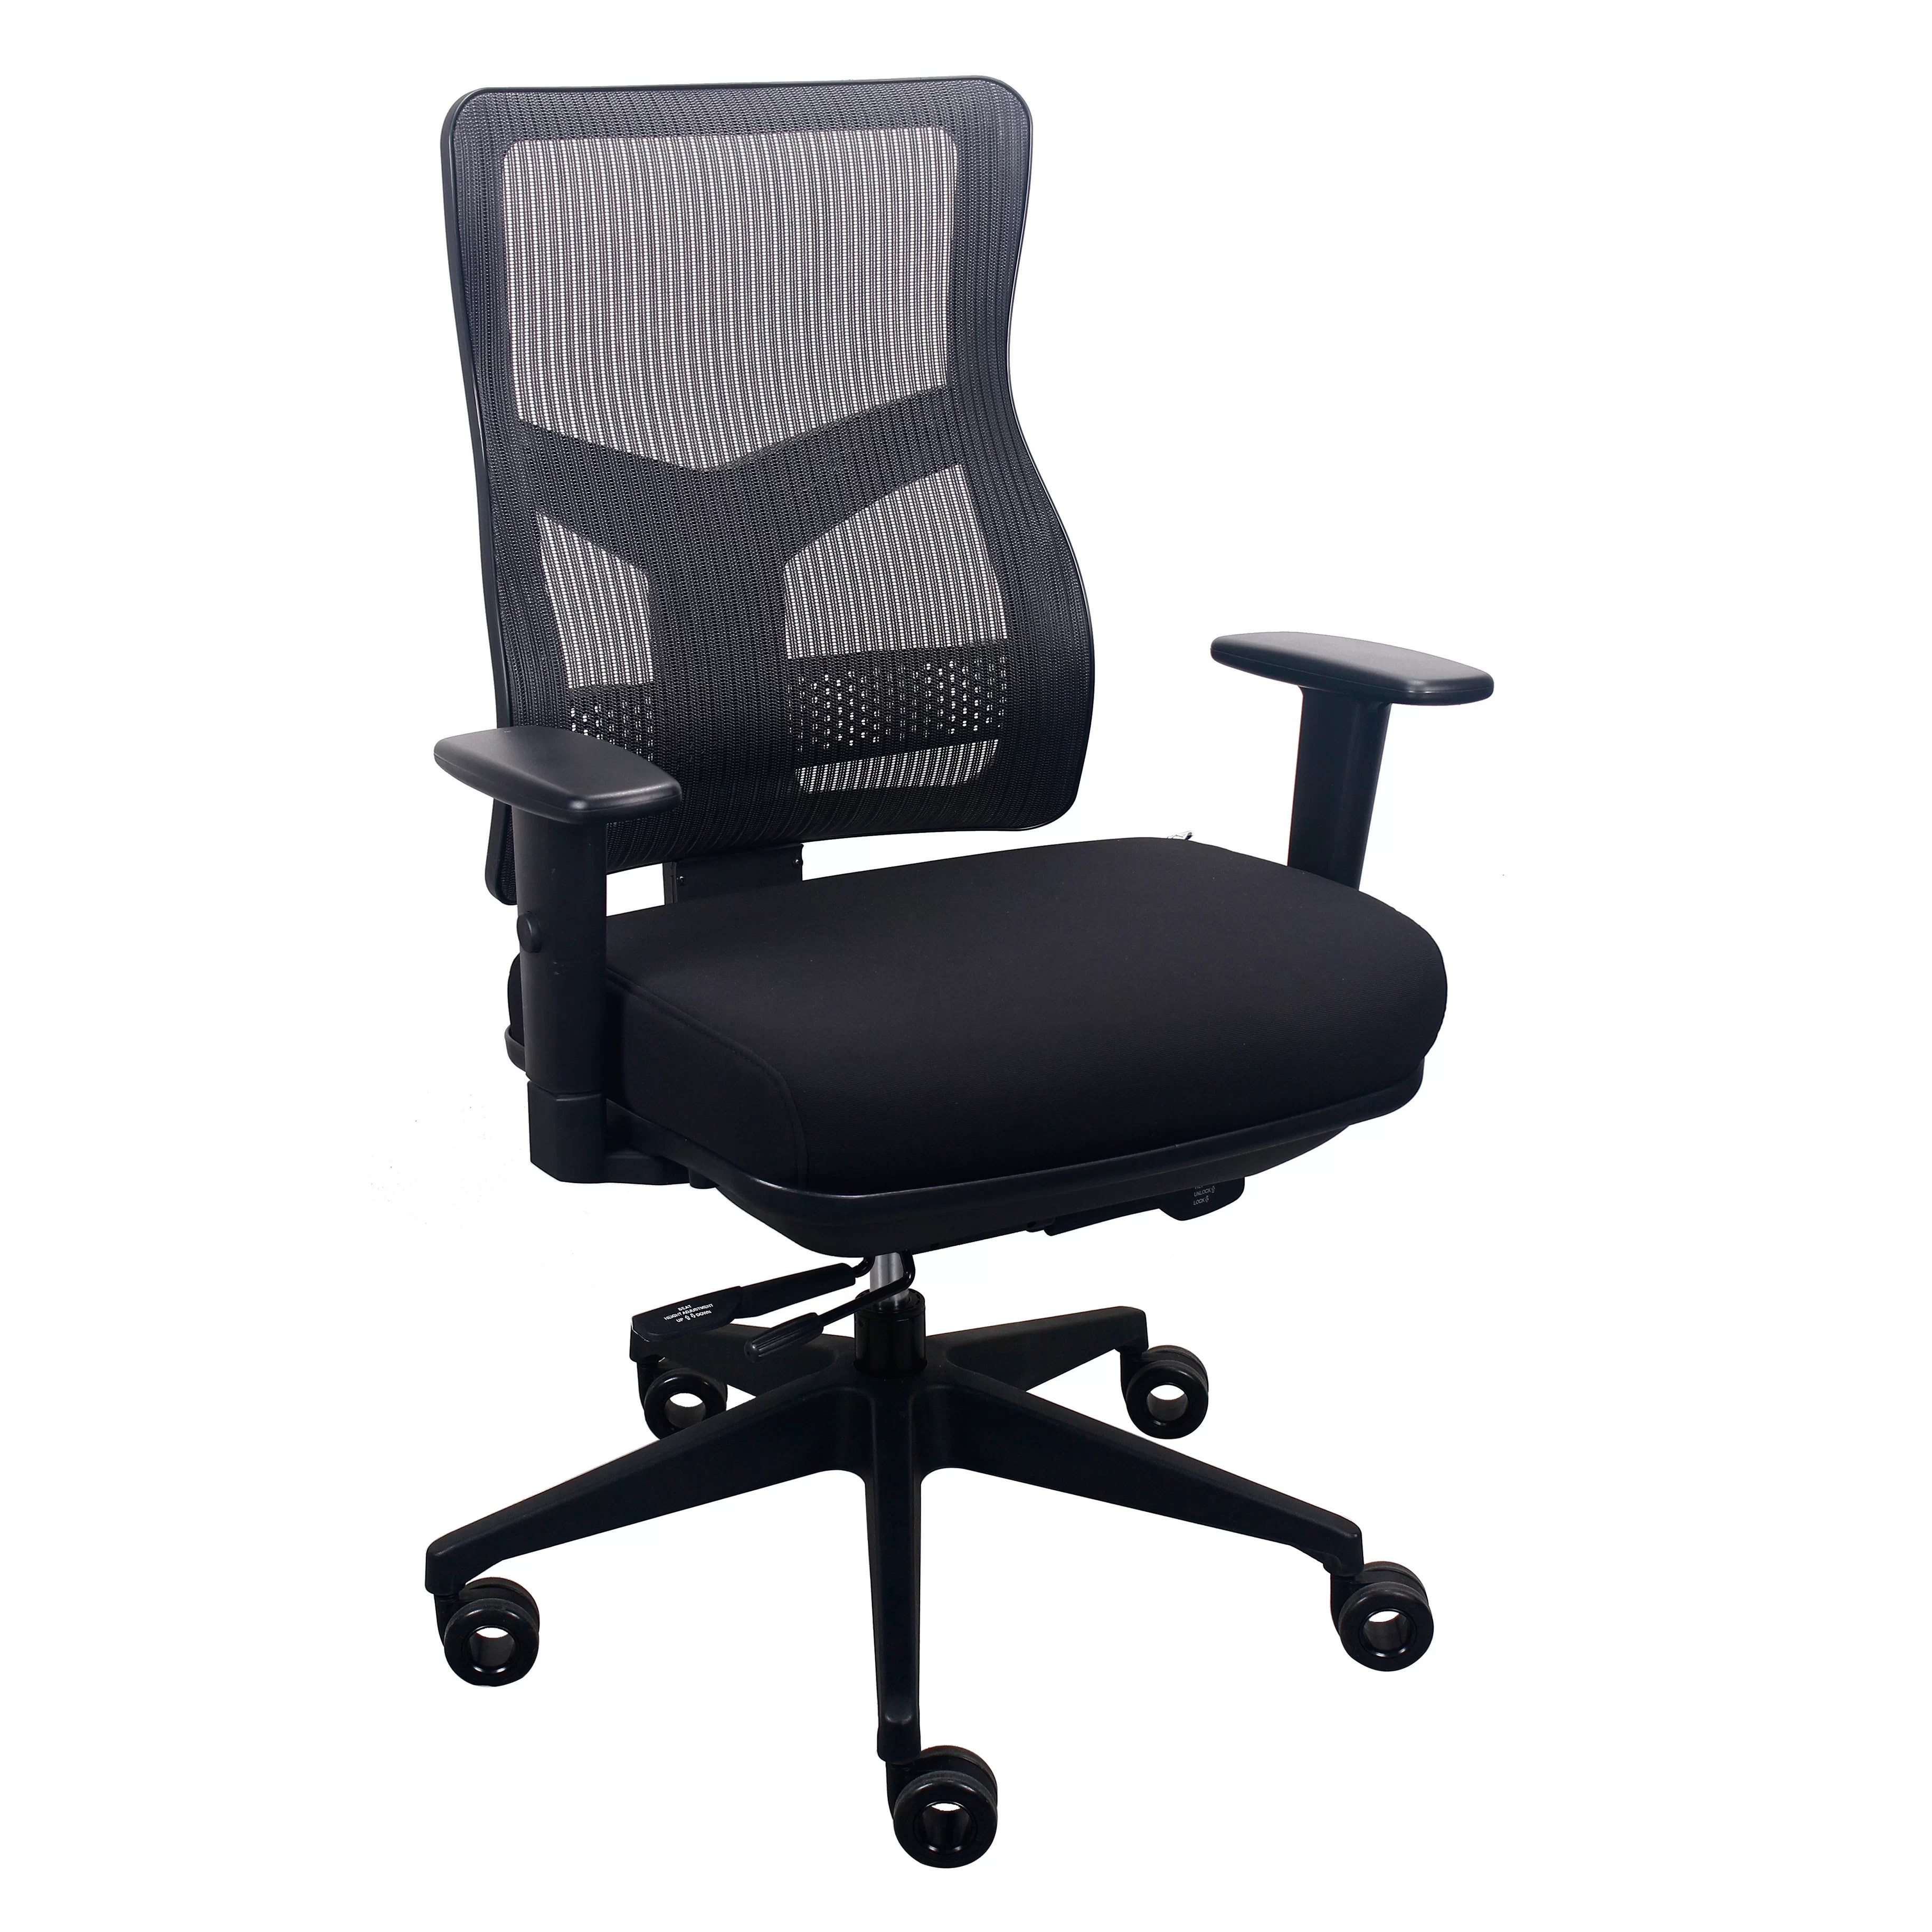 TempurPedic HighBack Mesh Executive Office Chair with